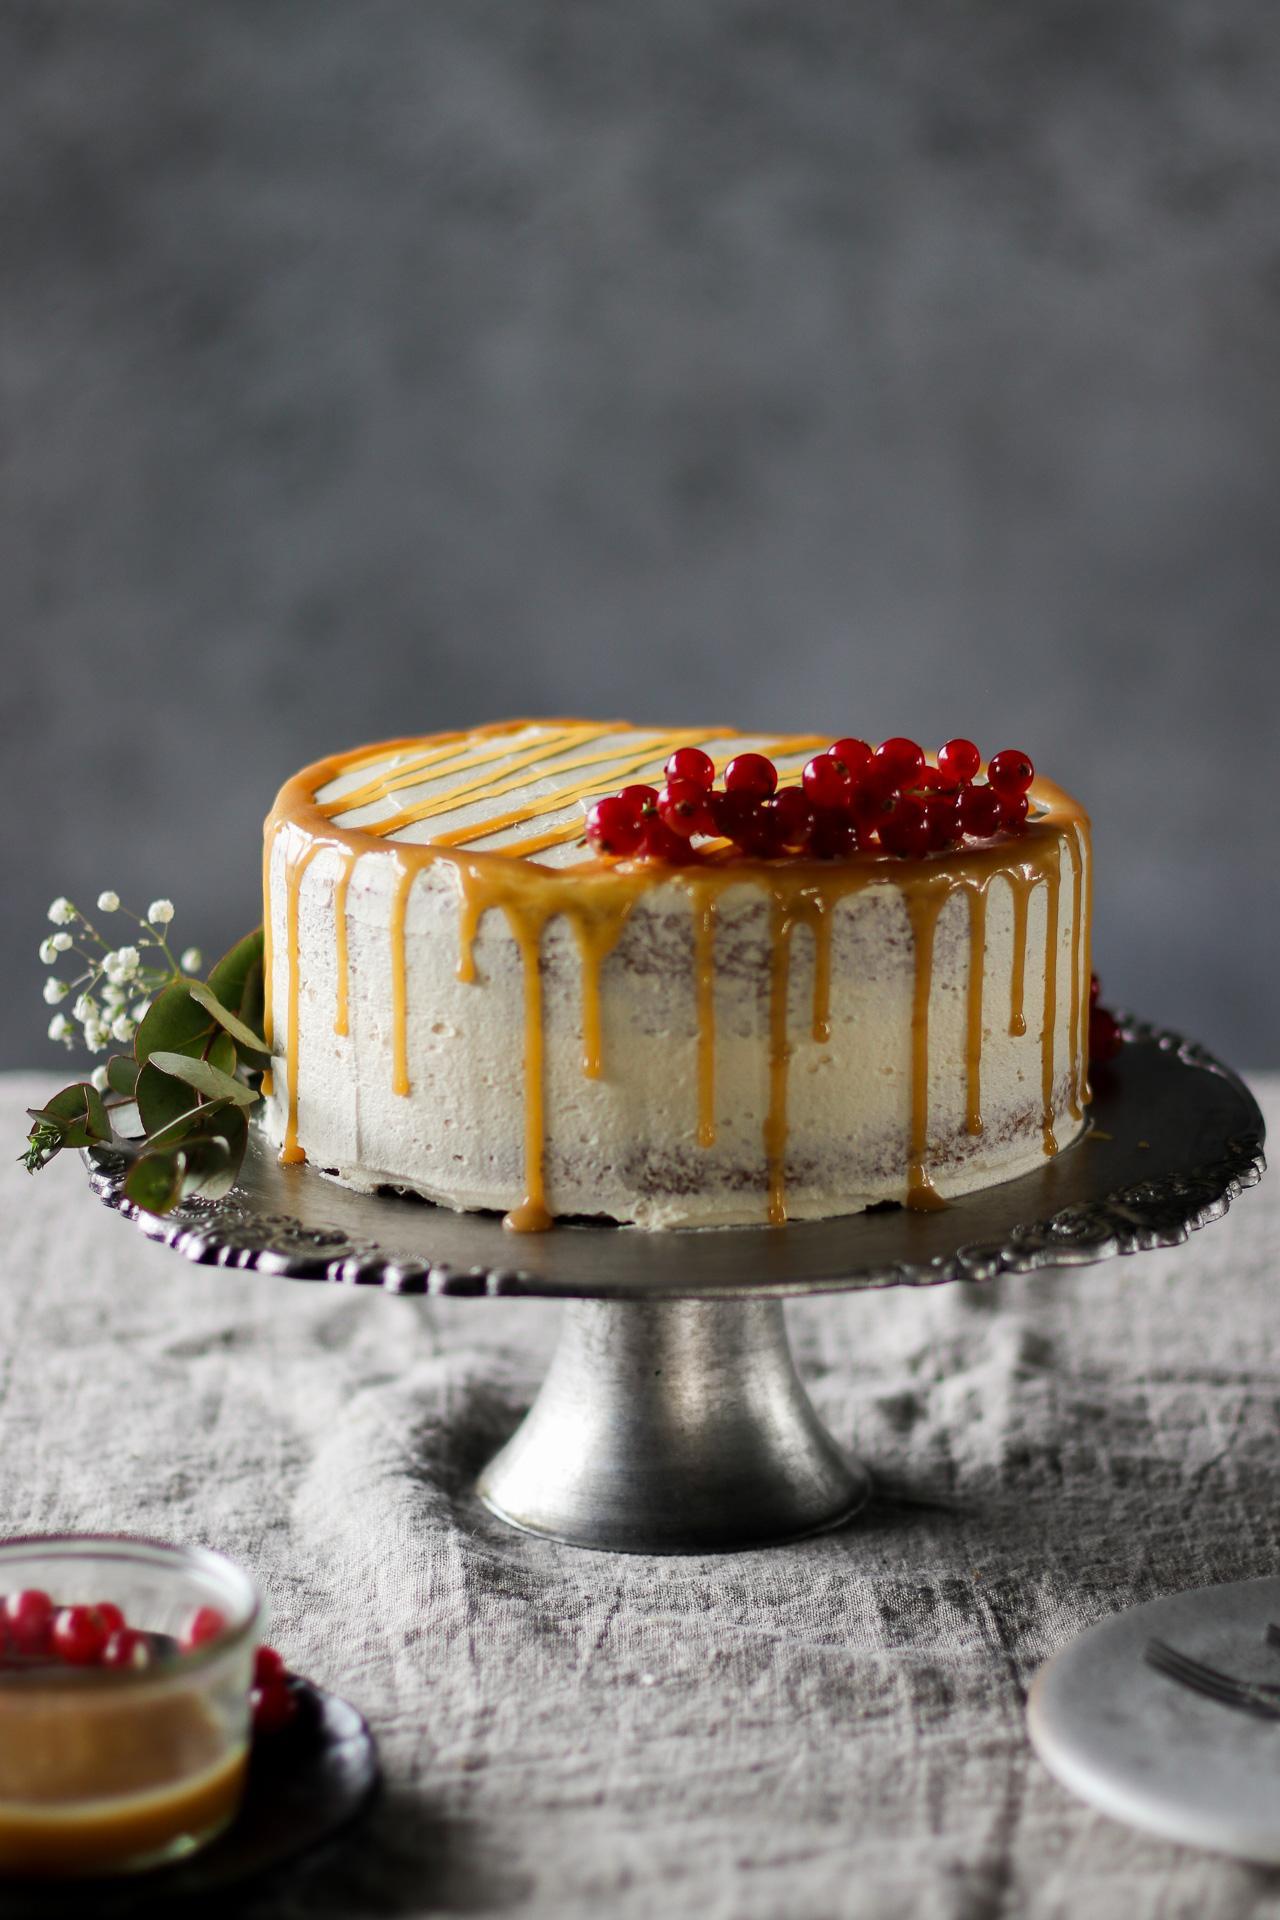 Main image of Vanilla Caramel Cake